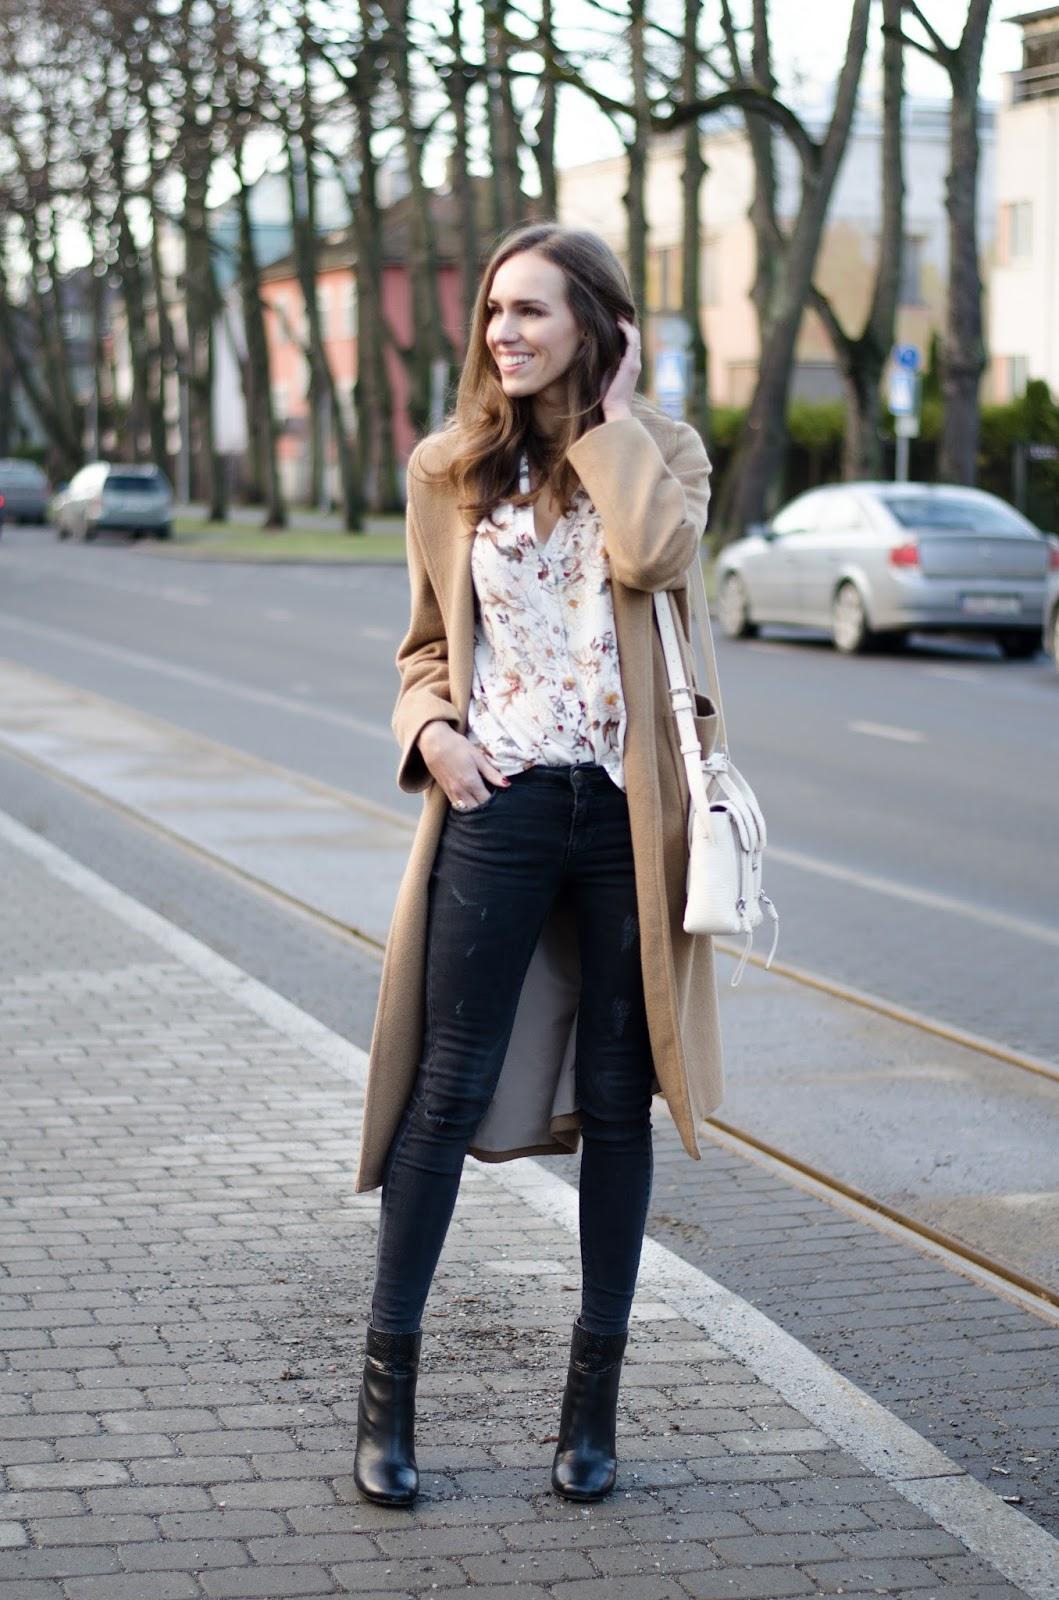 camel coat black jeans outfit